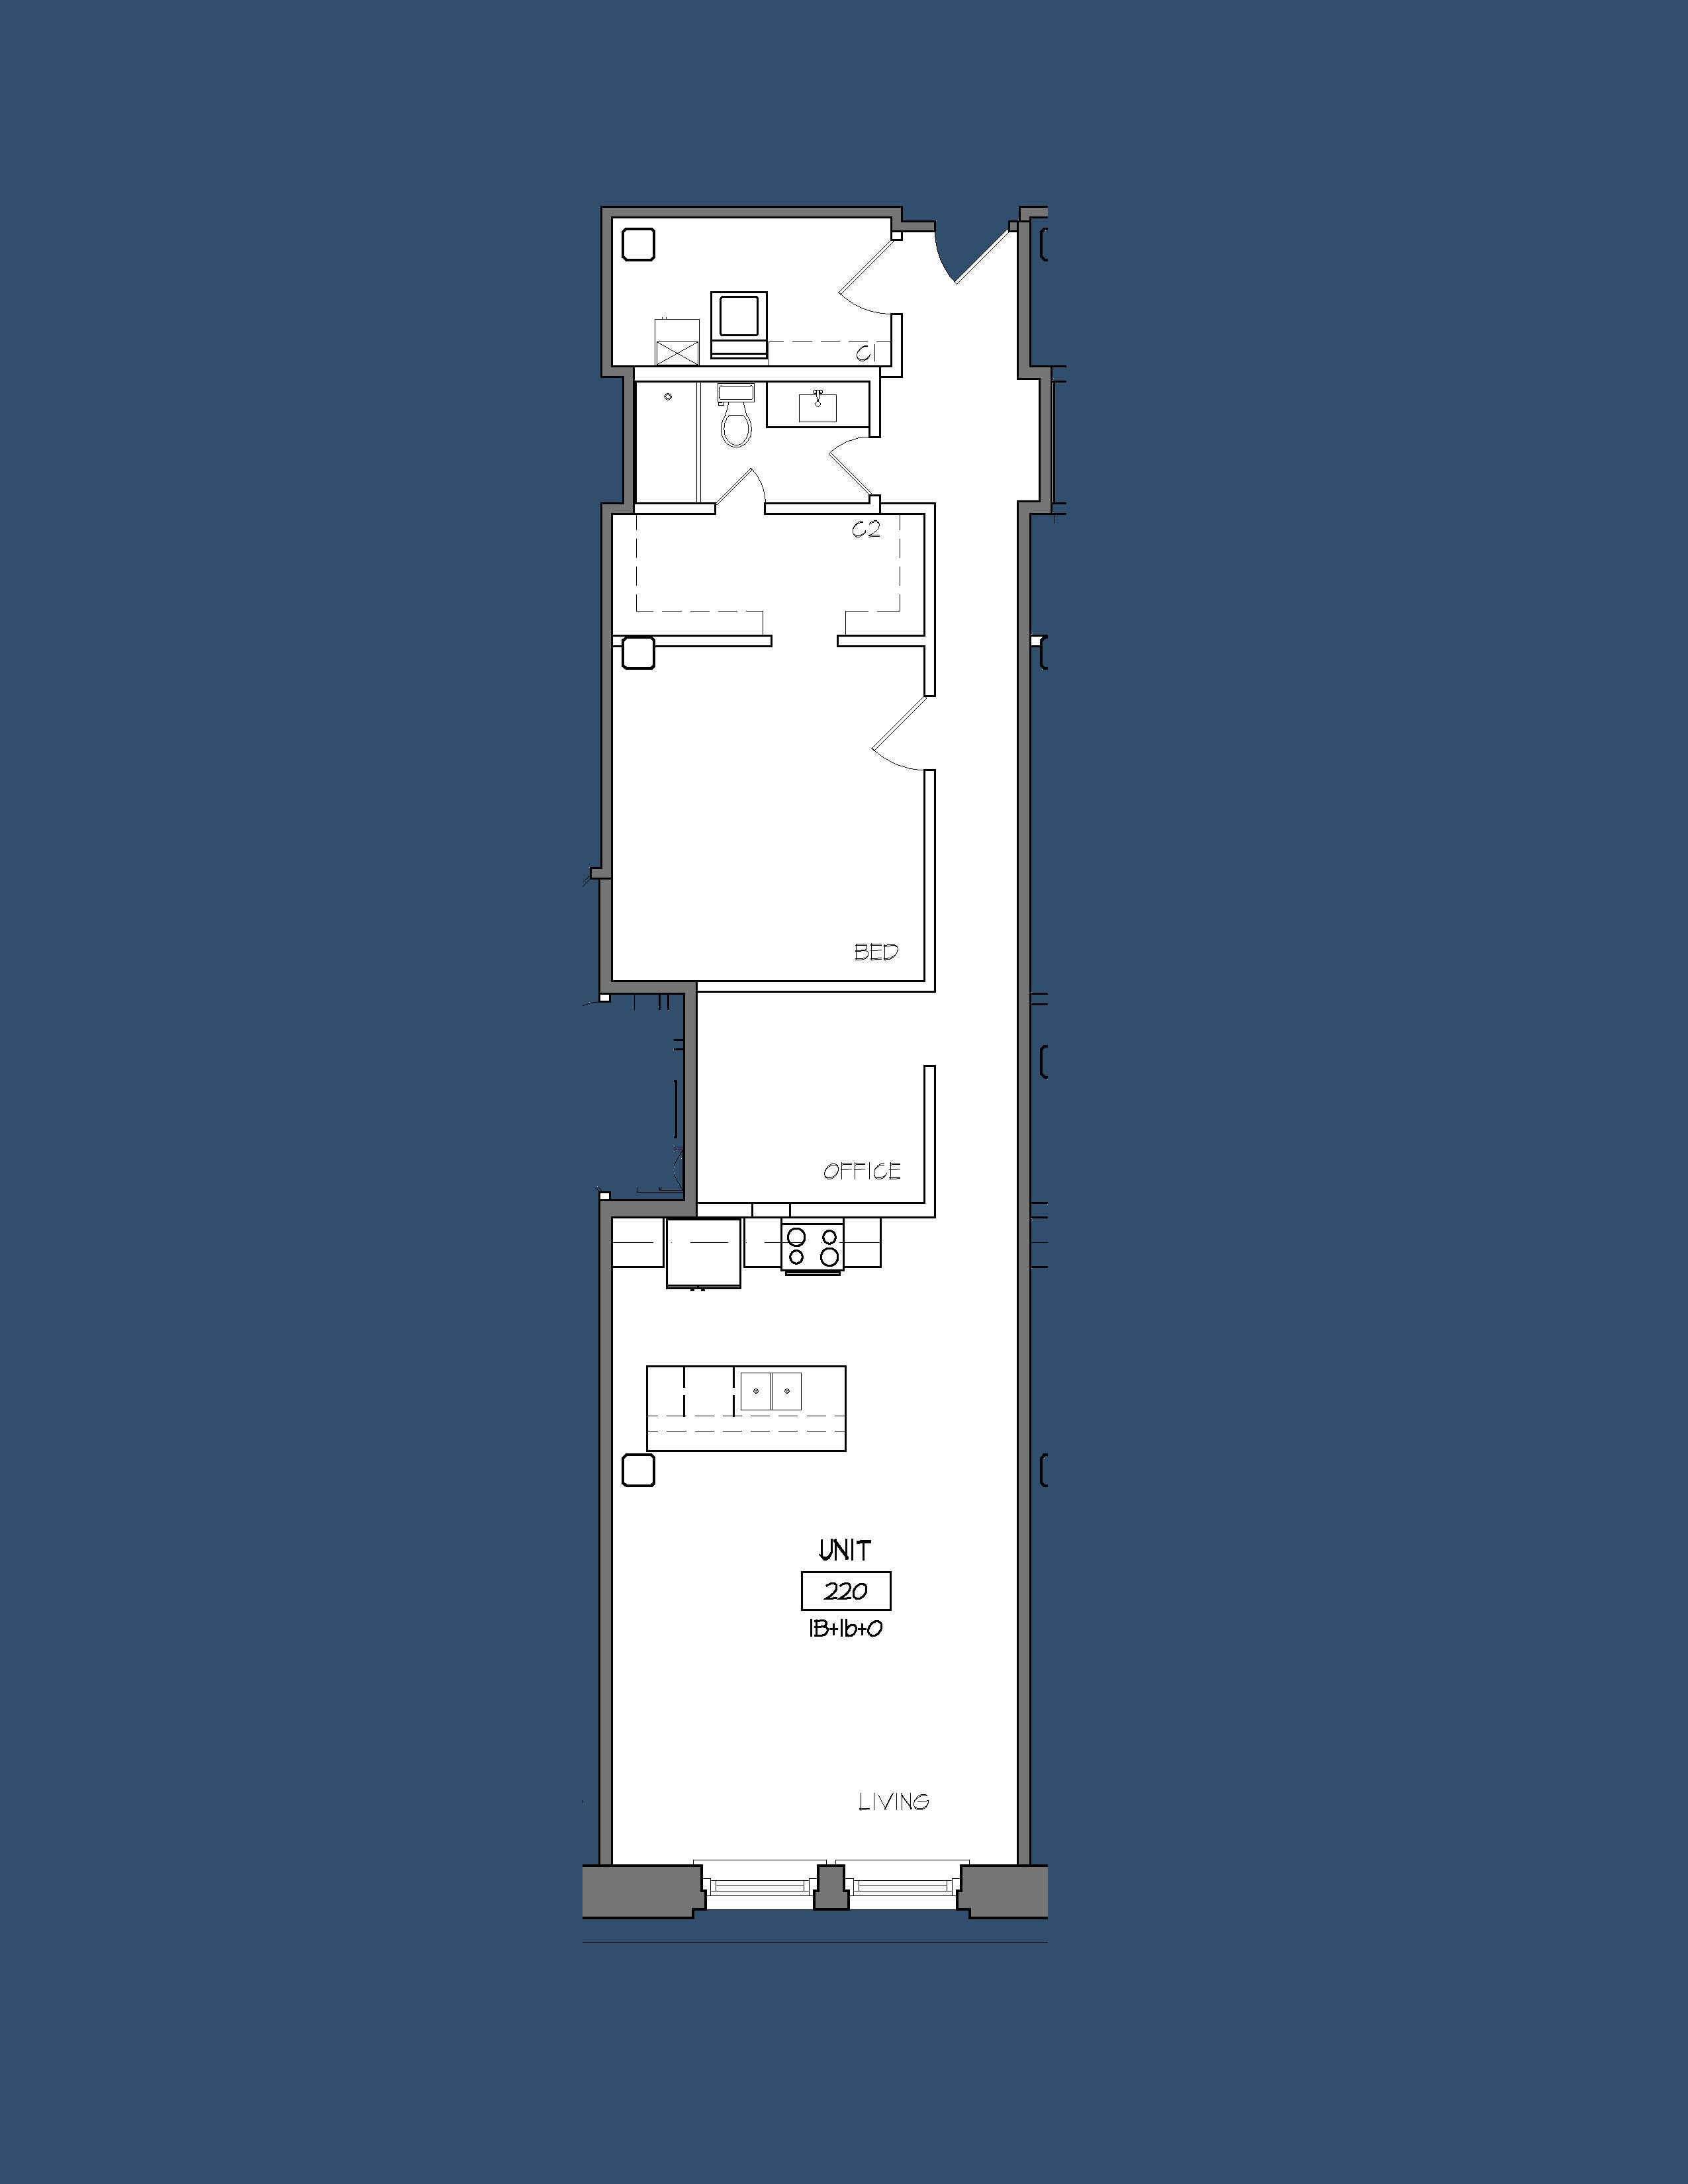 Unit 220 Floor Plan